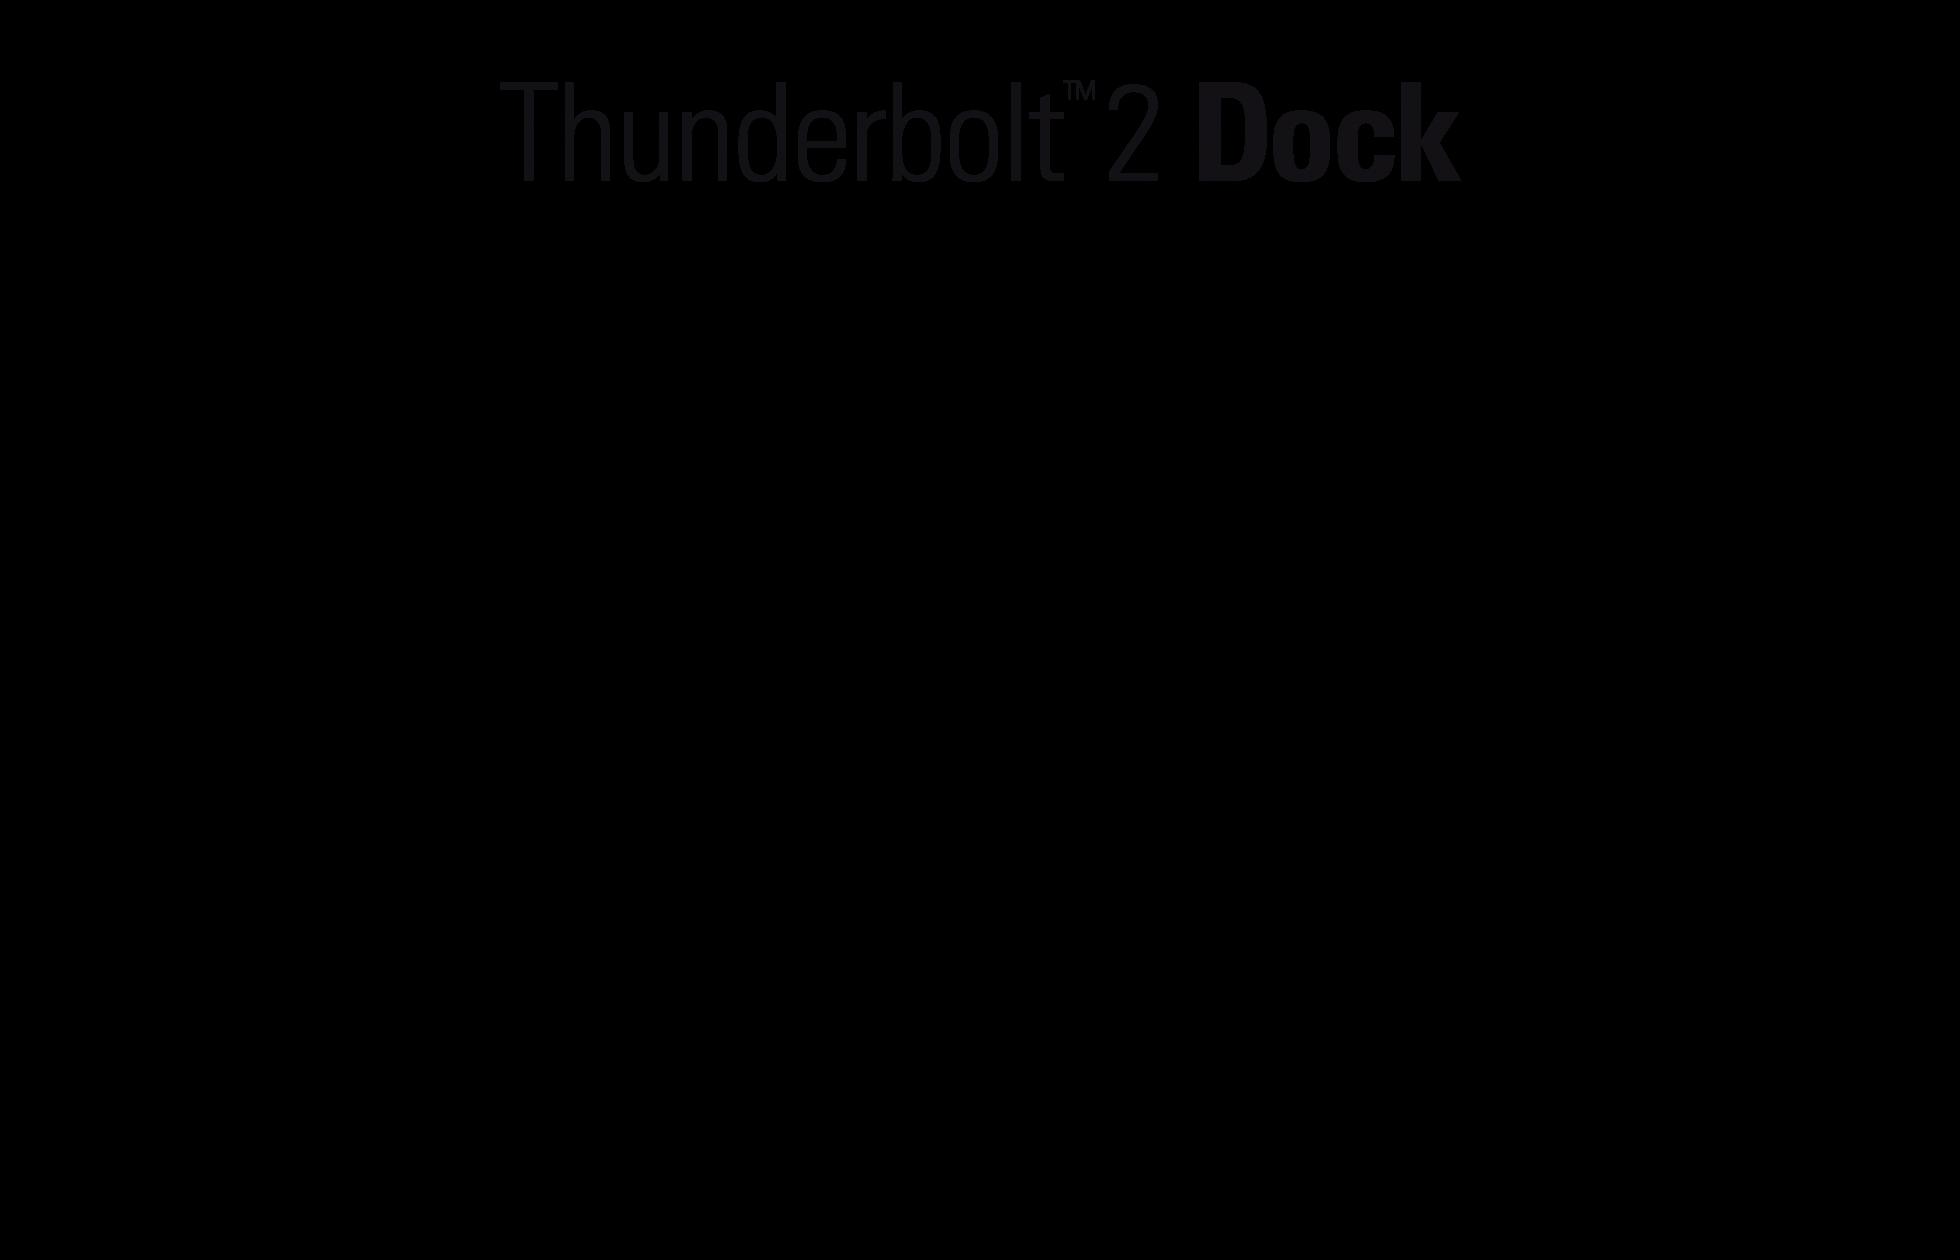 Thunderbolt 2 Dock | elgato.com